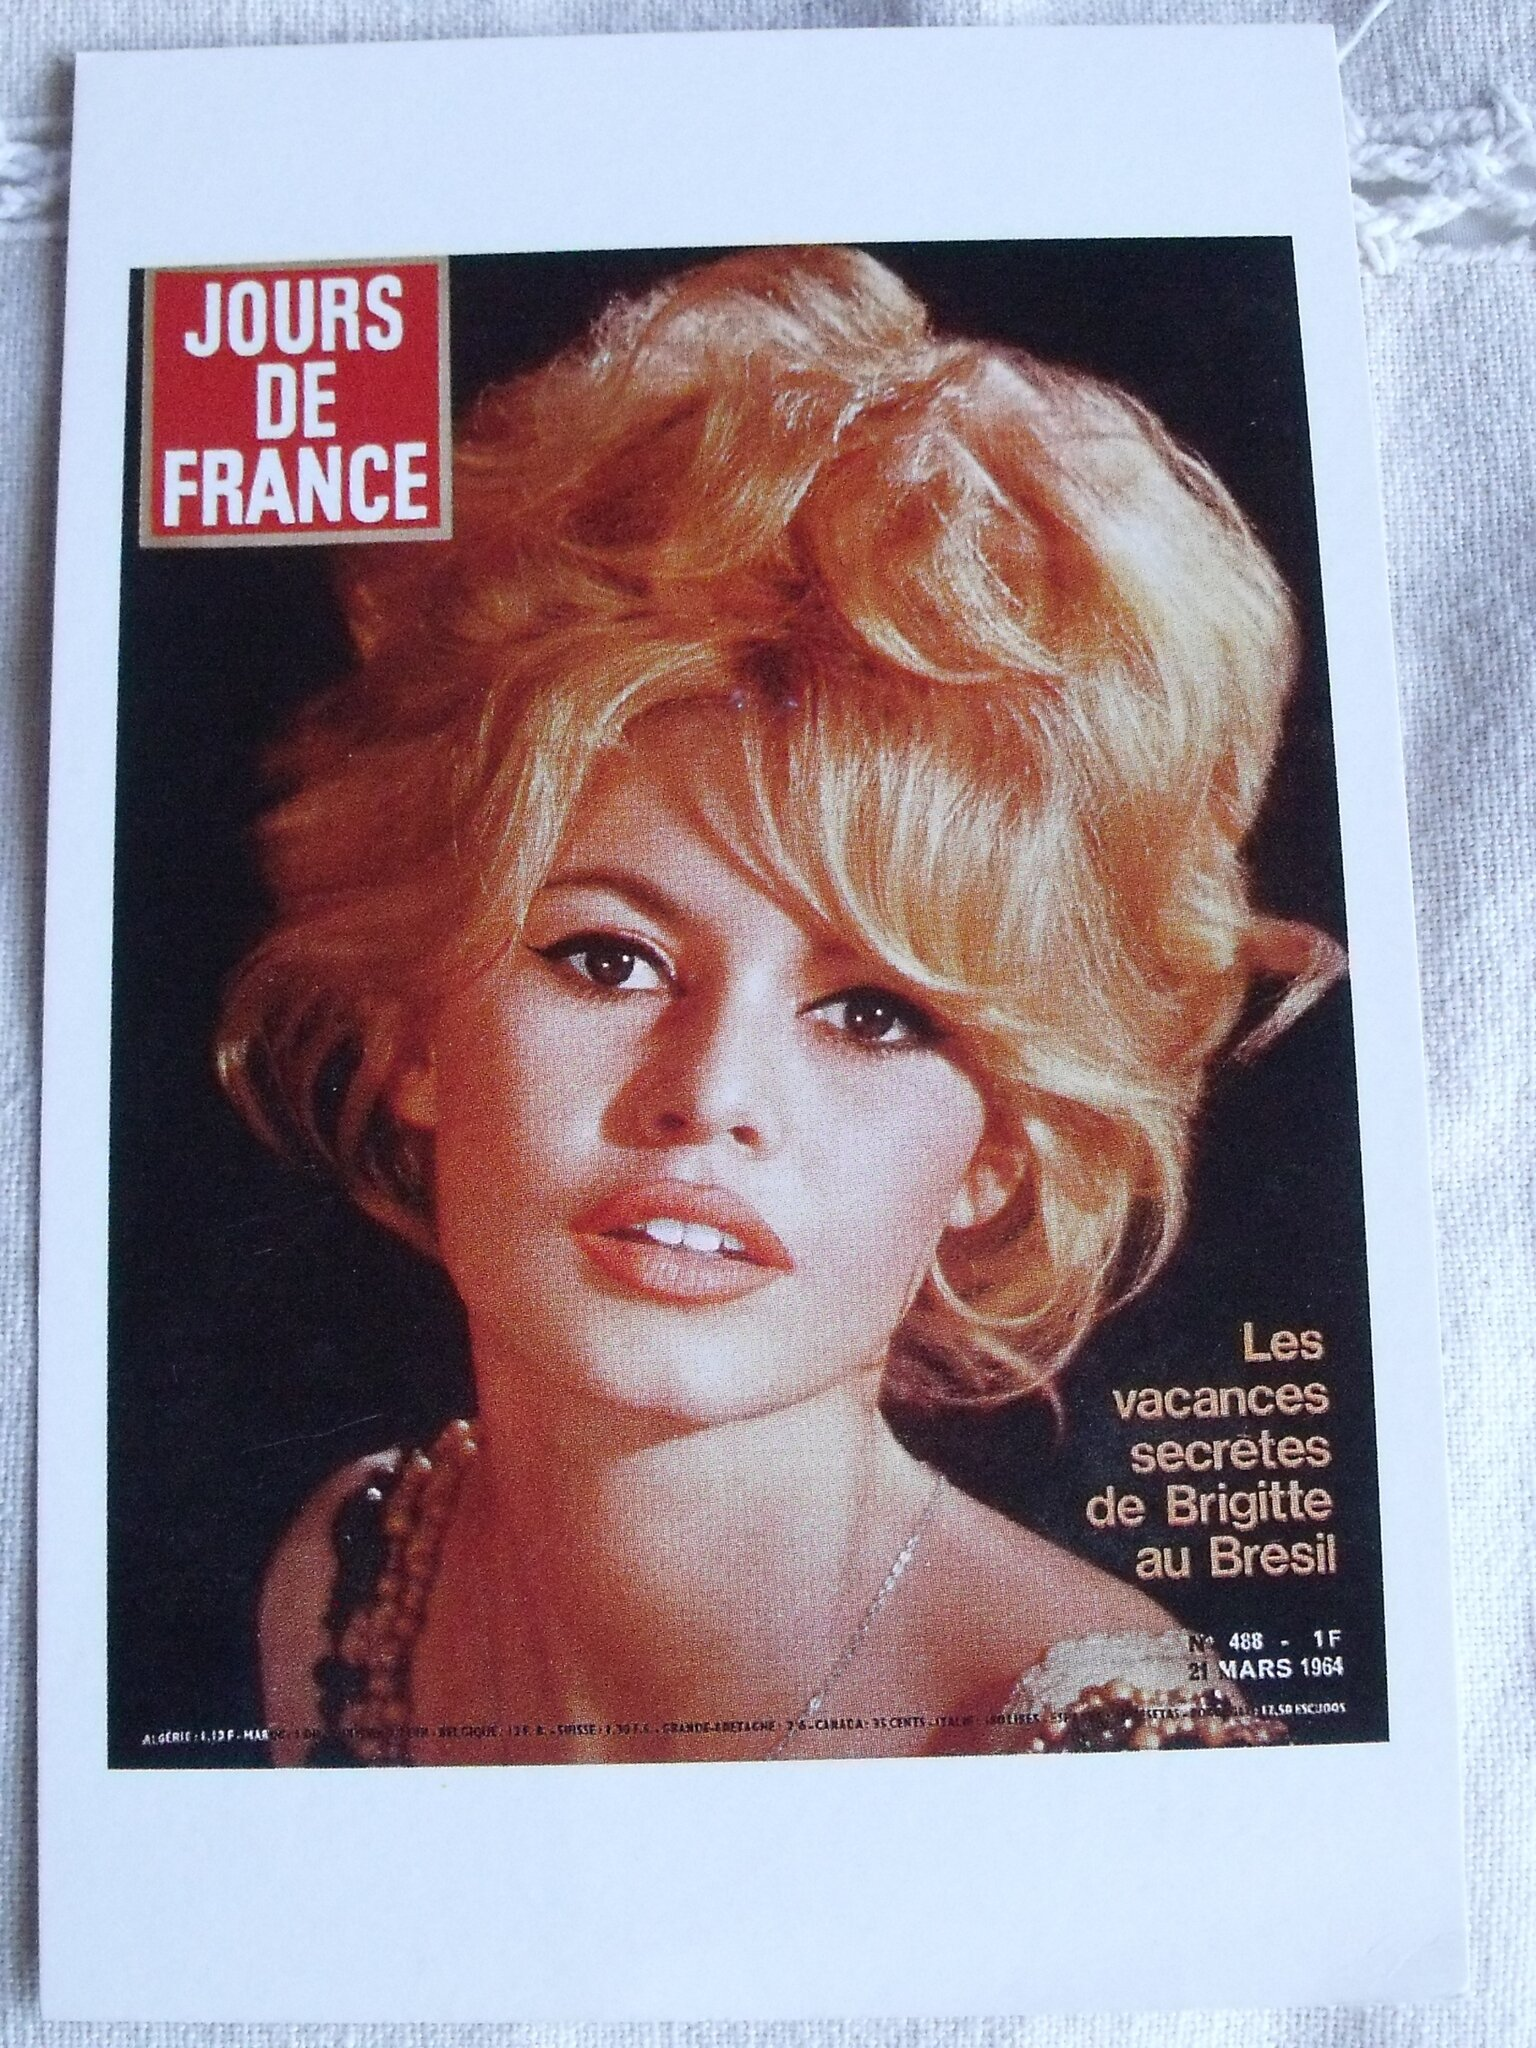 Brigitte Bardot 1964